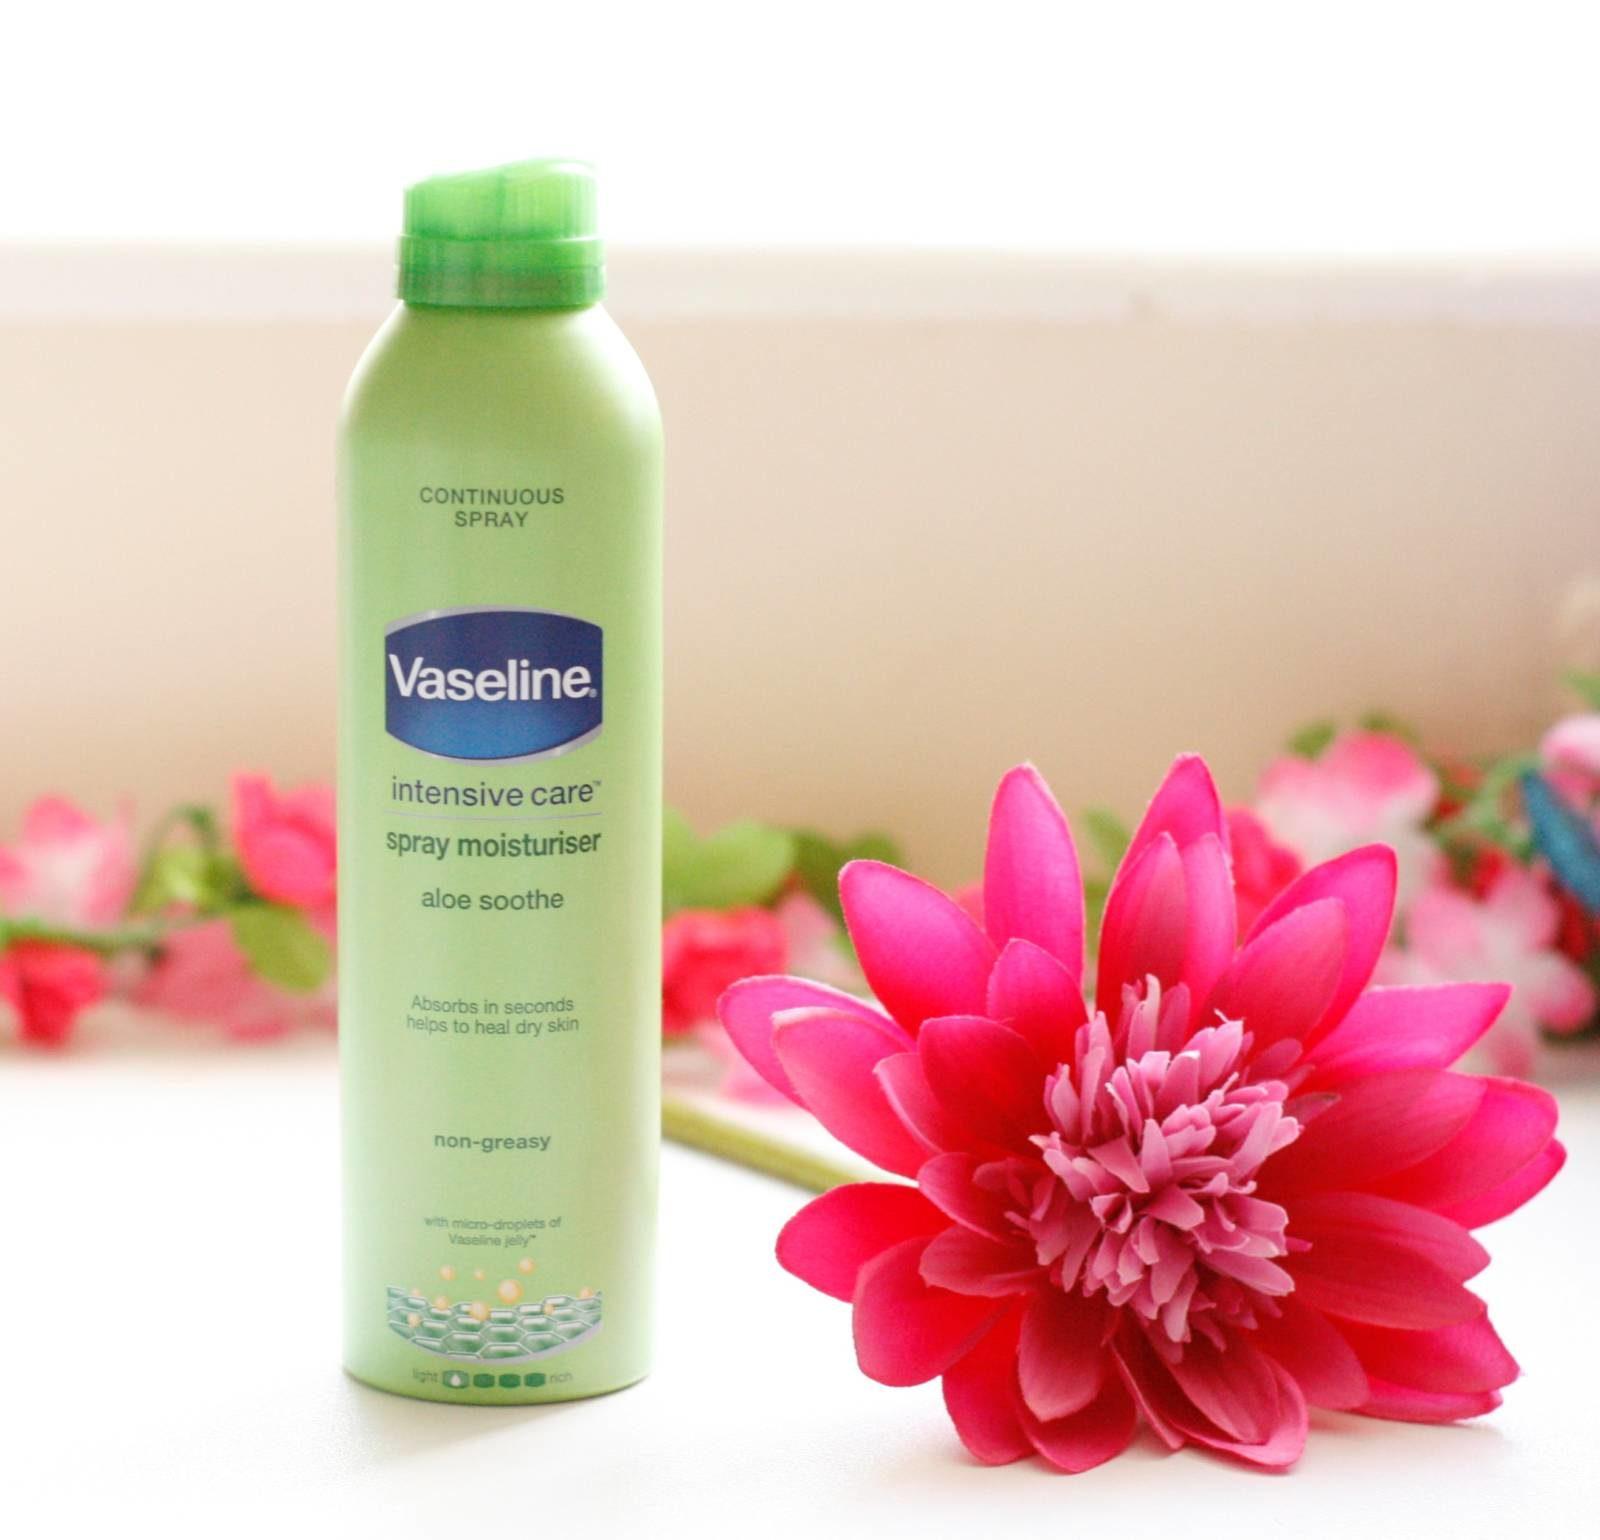 Vaseline Intensive Care Aloe Sooth Spray Moisturiser Review